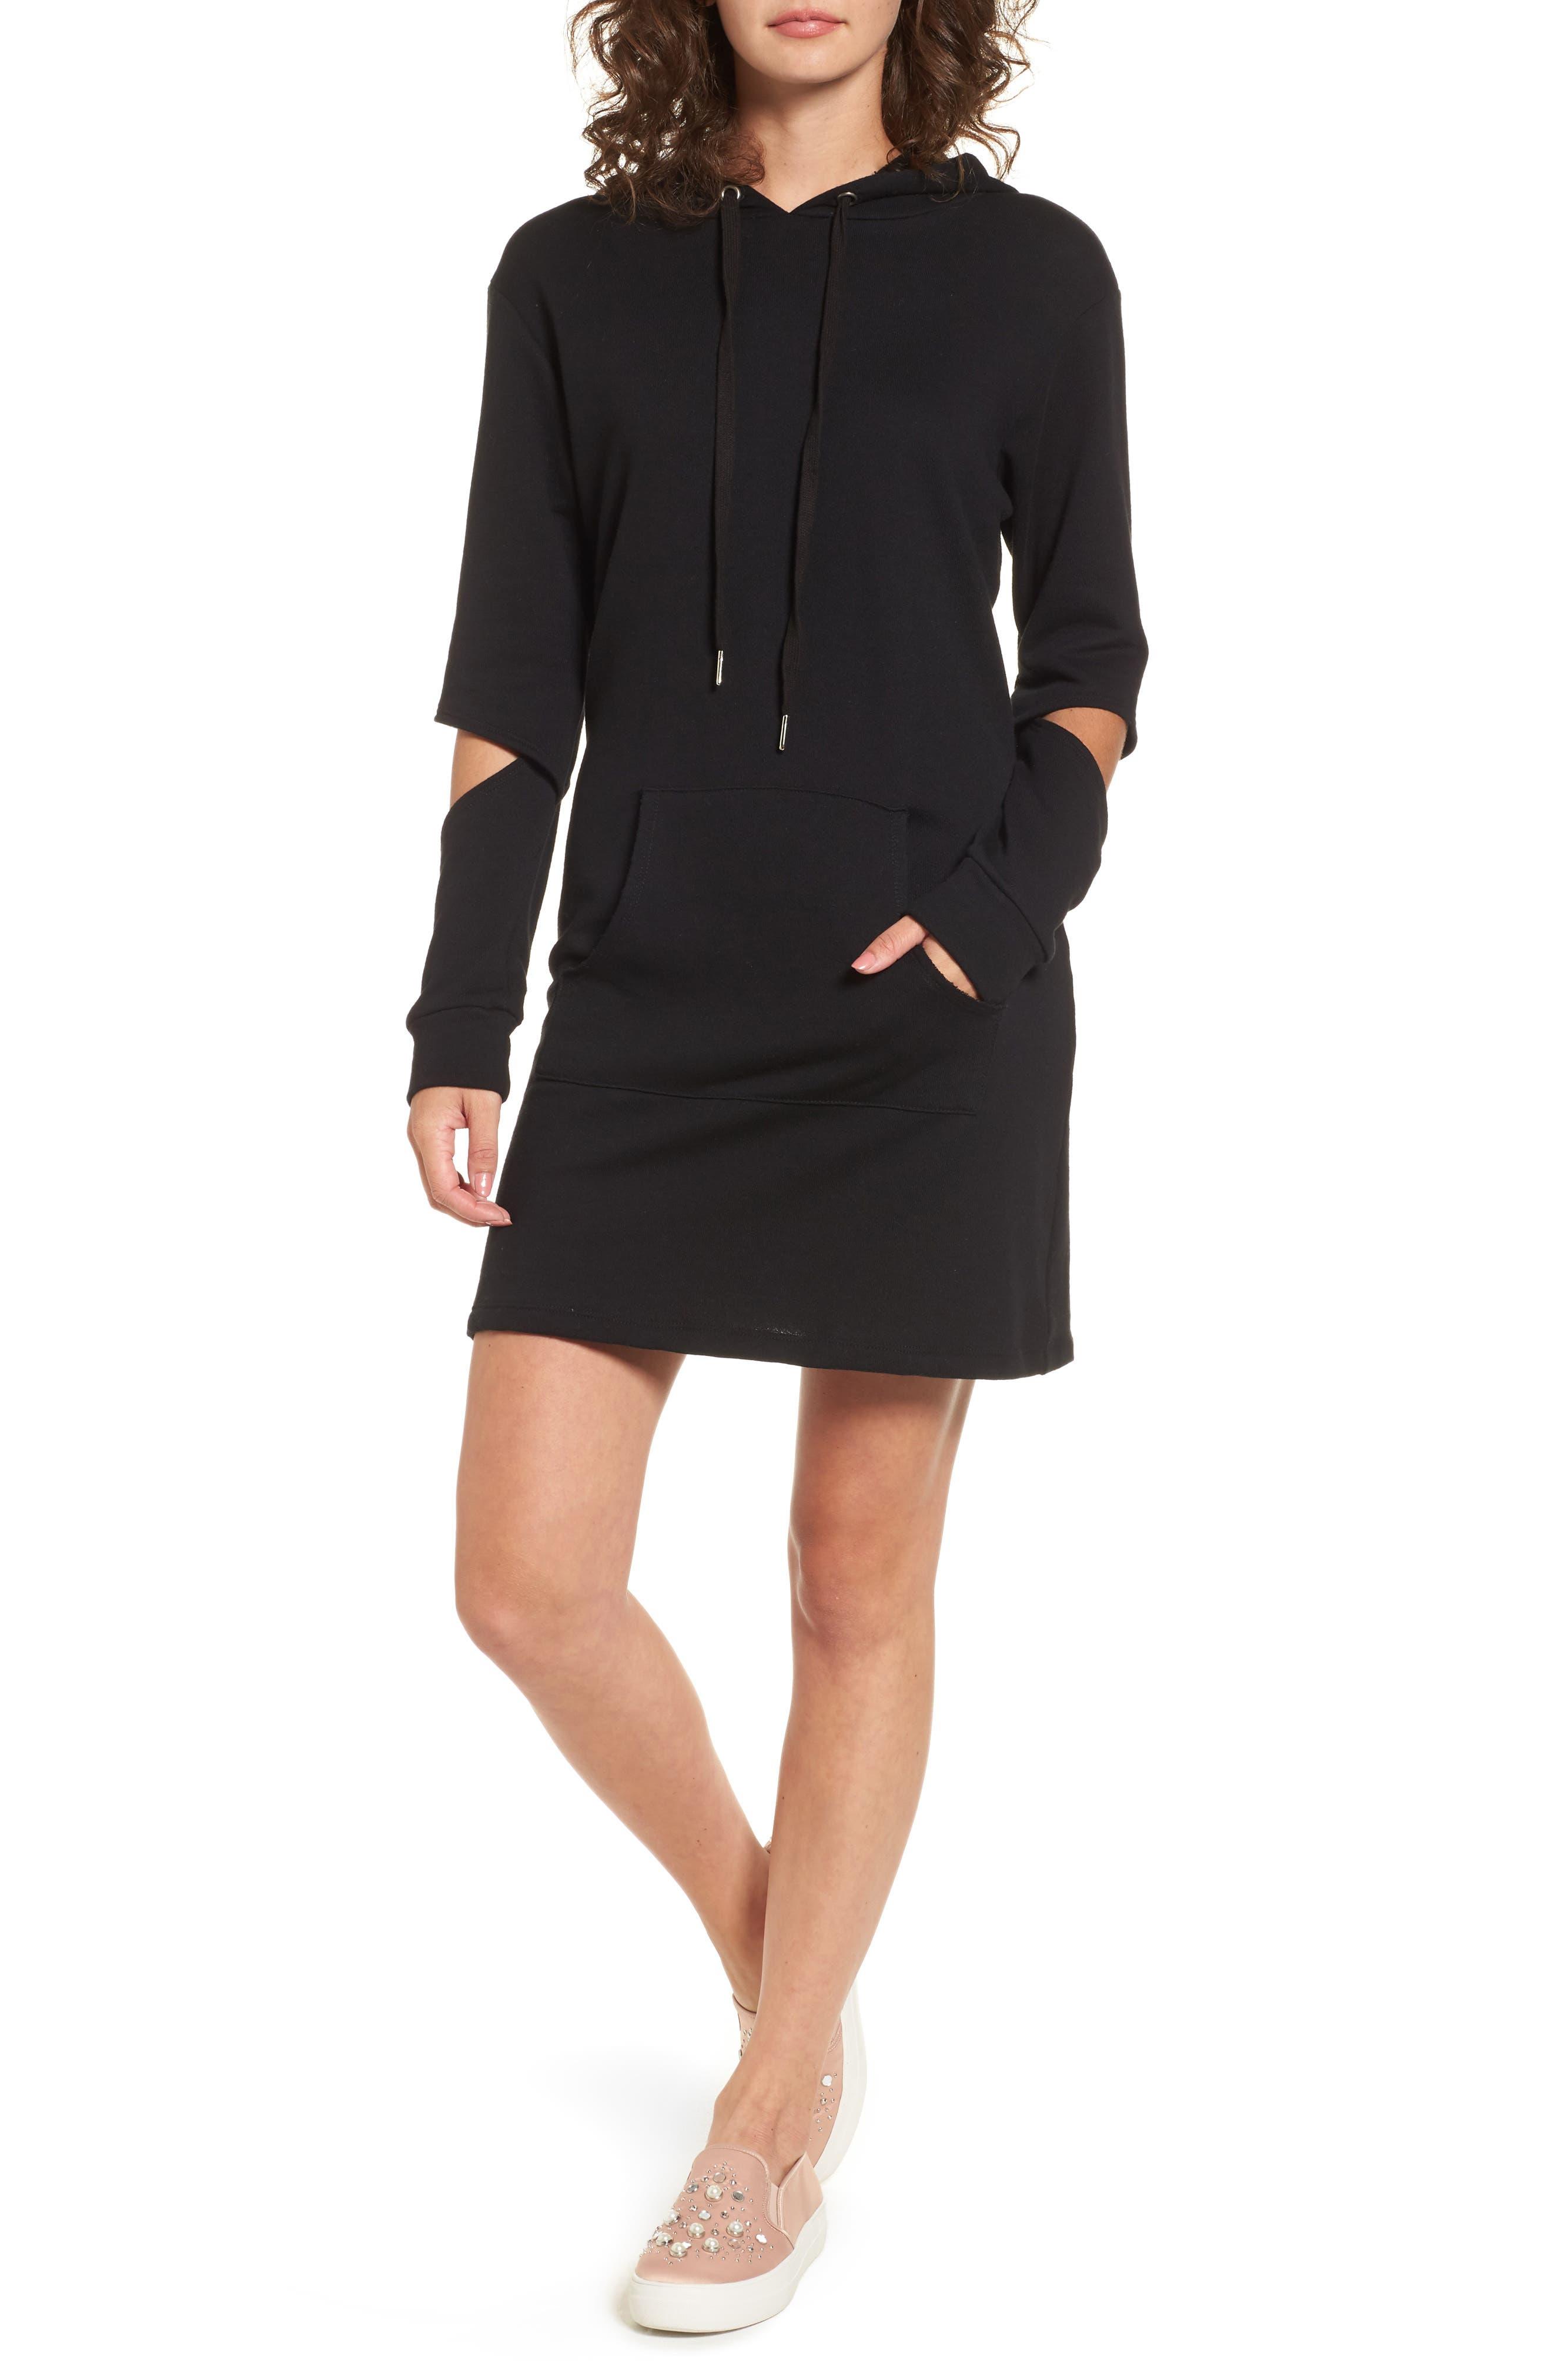 Main Image - Socialite Cutout Sleeve Hoodie Dress